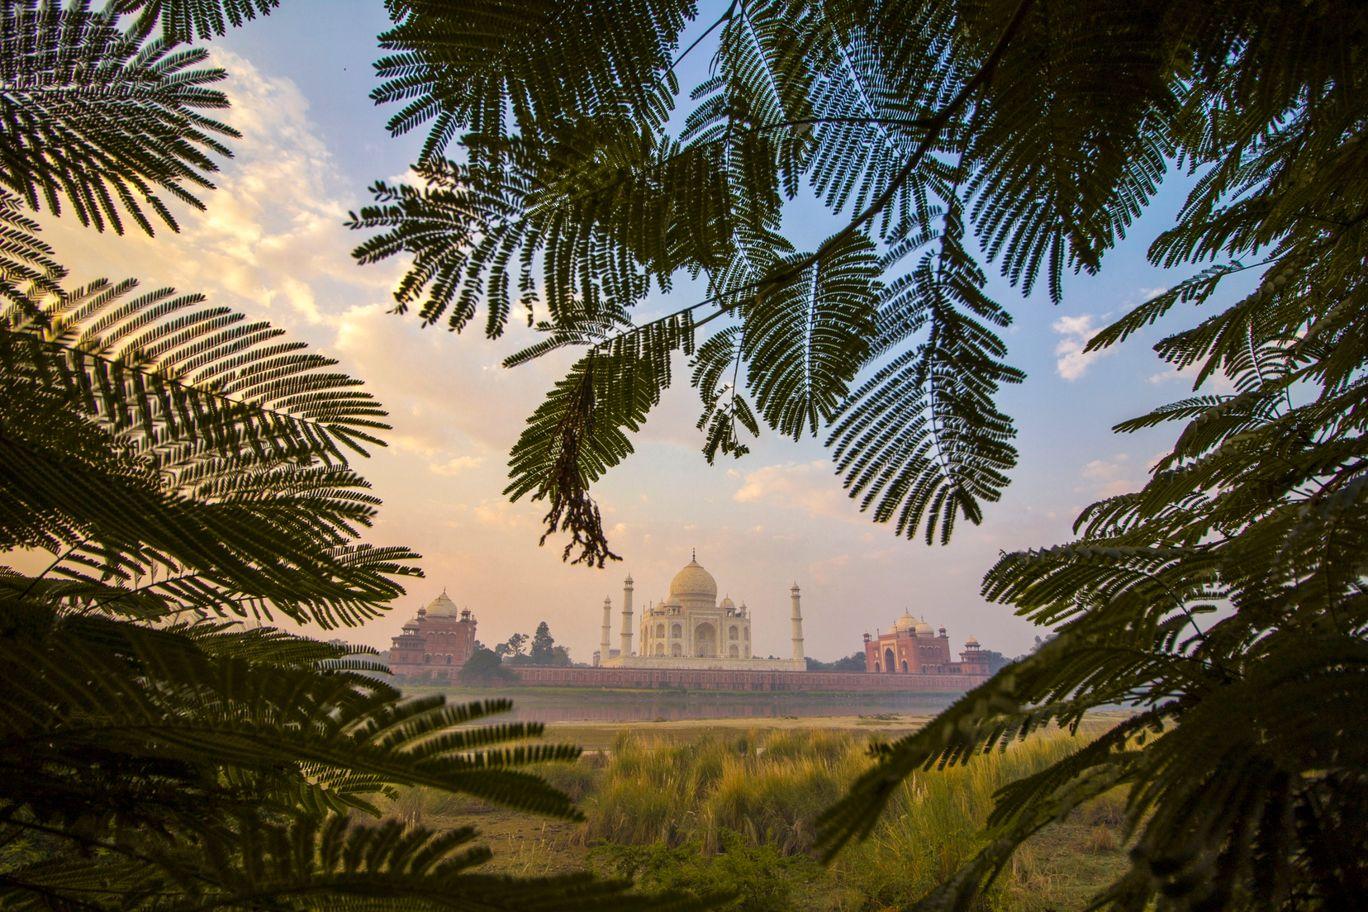 Photo of Taj Mahal By Harshit Chawla